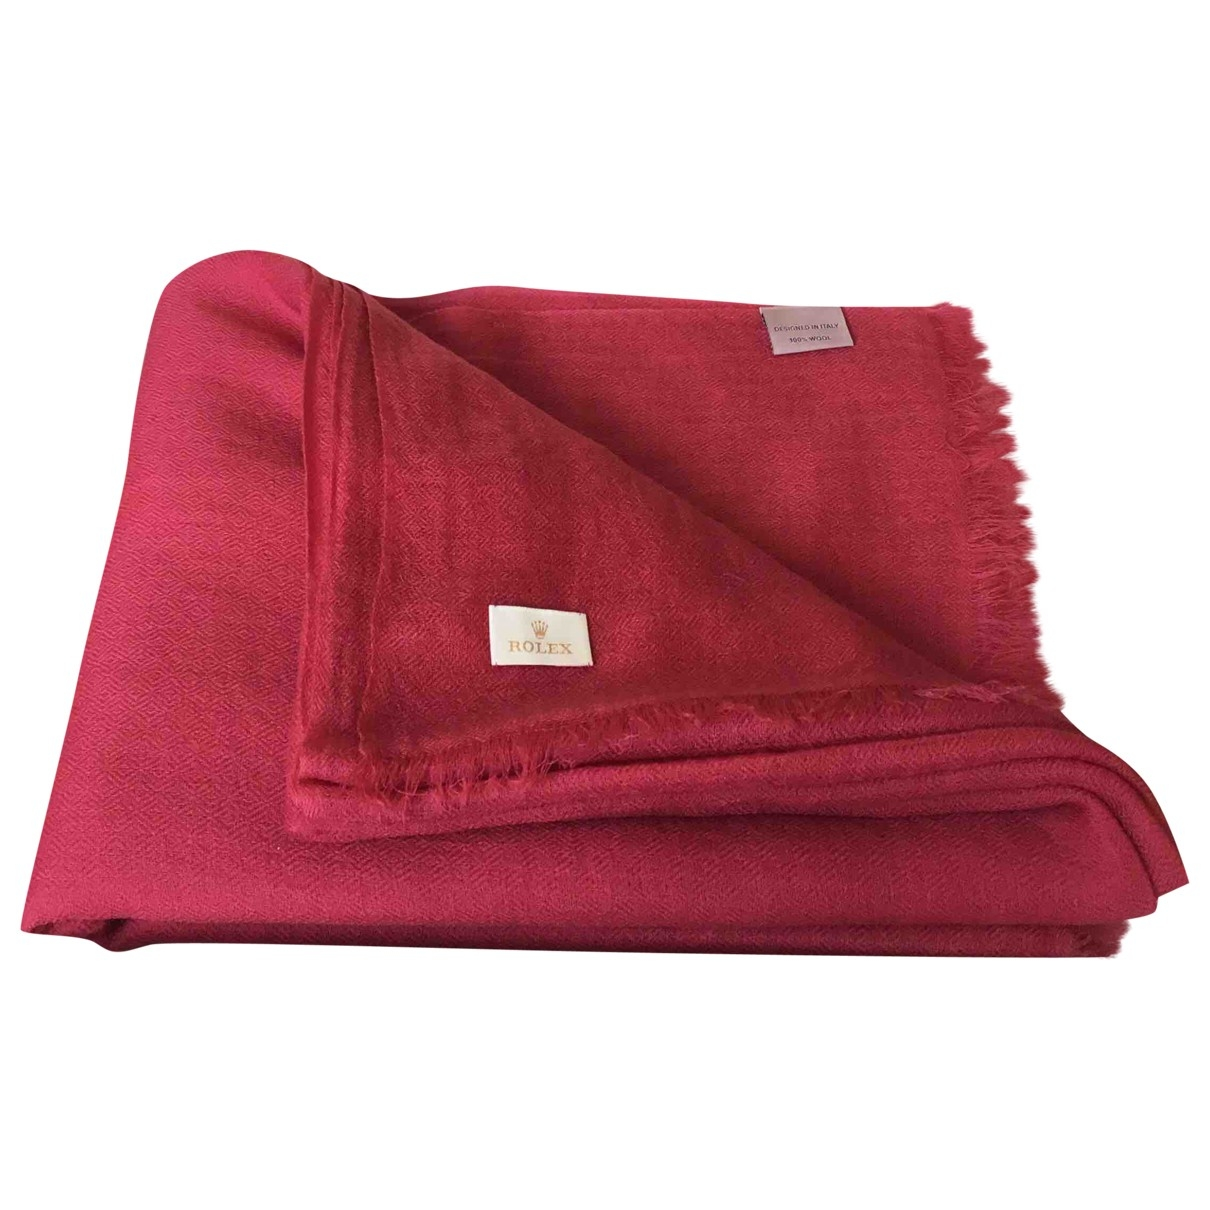 Rolex \N Burgundy Wool scarf & pocket squares for Men \N